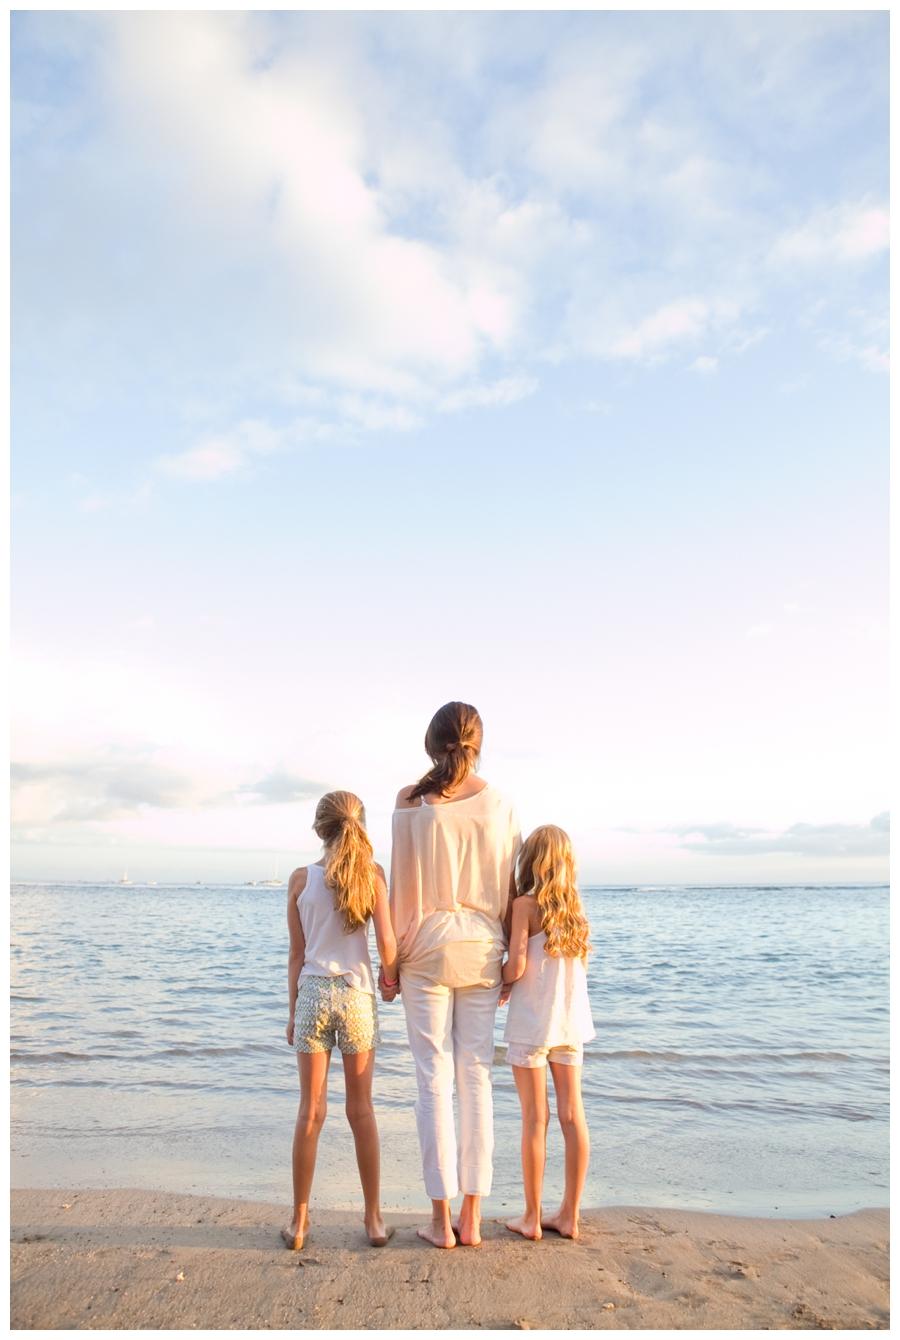 sandiegofamilyphotography-223.jpg